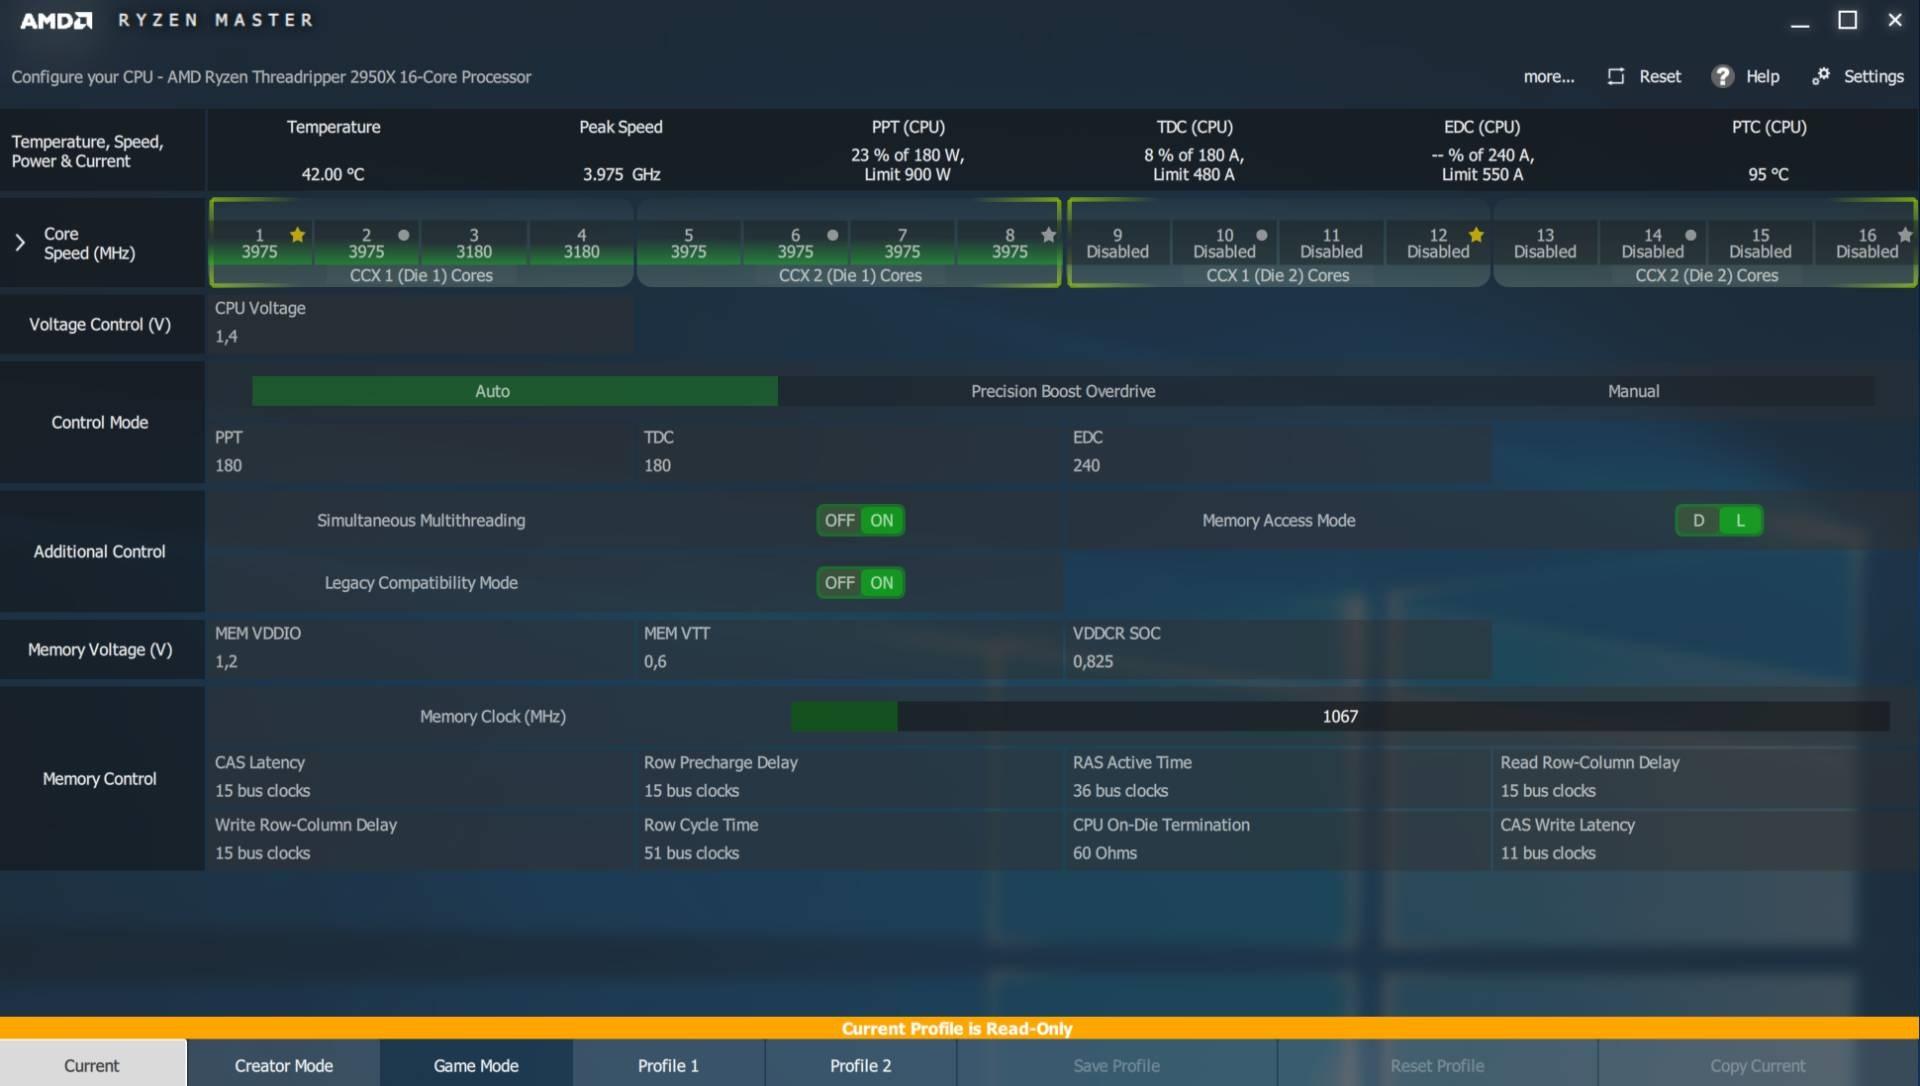 AMD Ryzen Threadripper 2950X, recenze, Precision Boost Overdrive